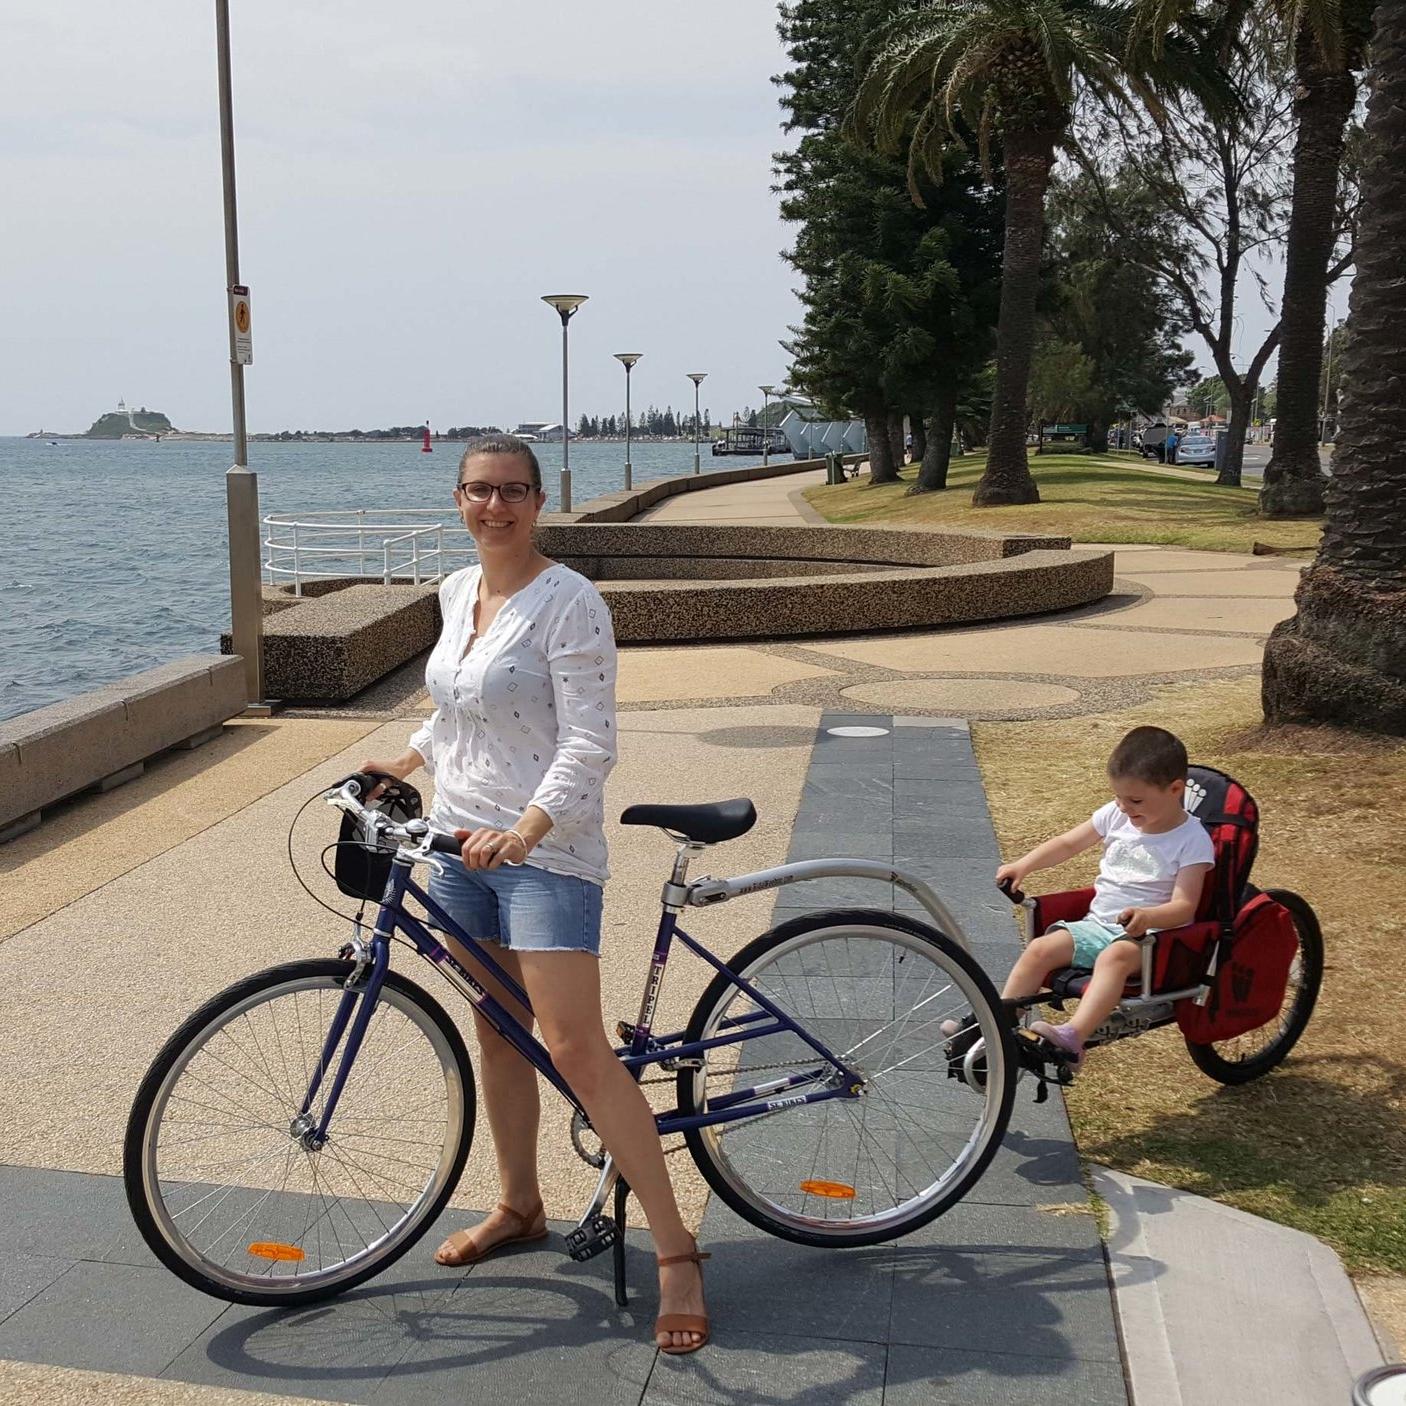 Bike with weehoo trailer